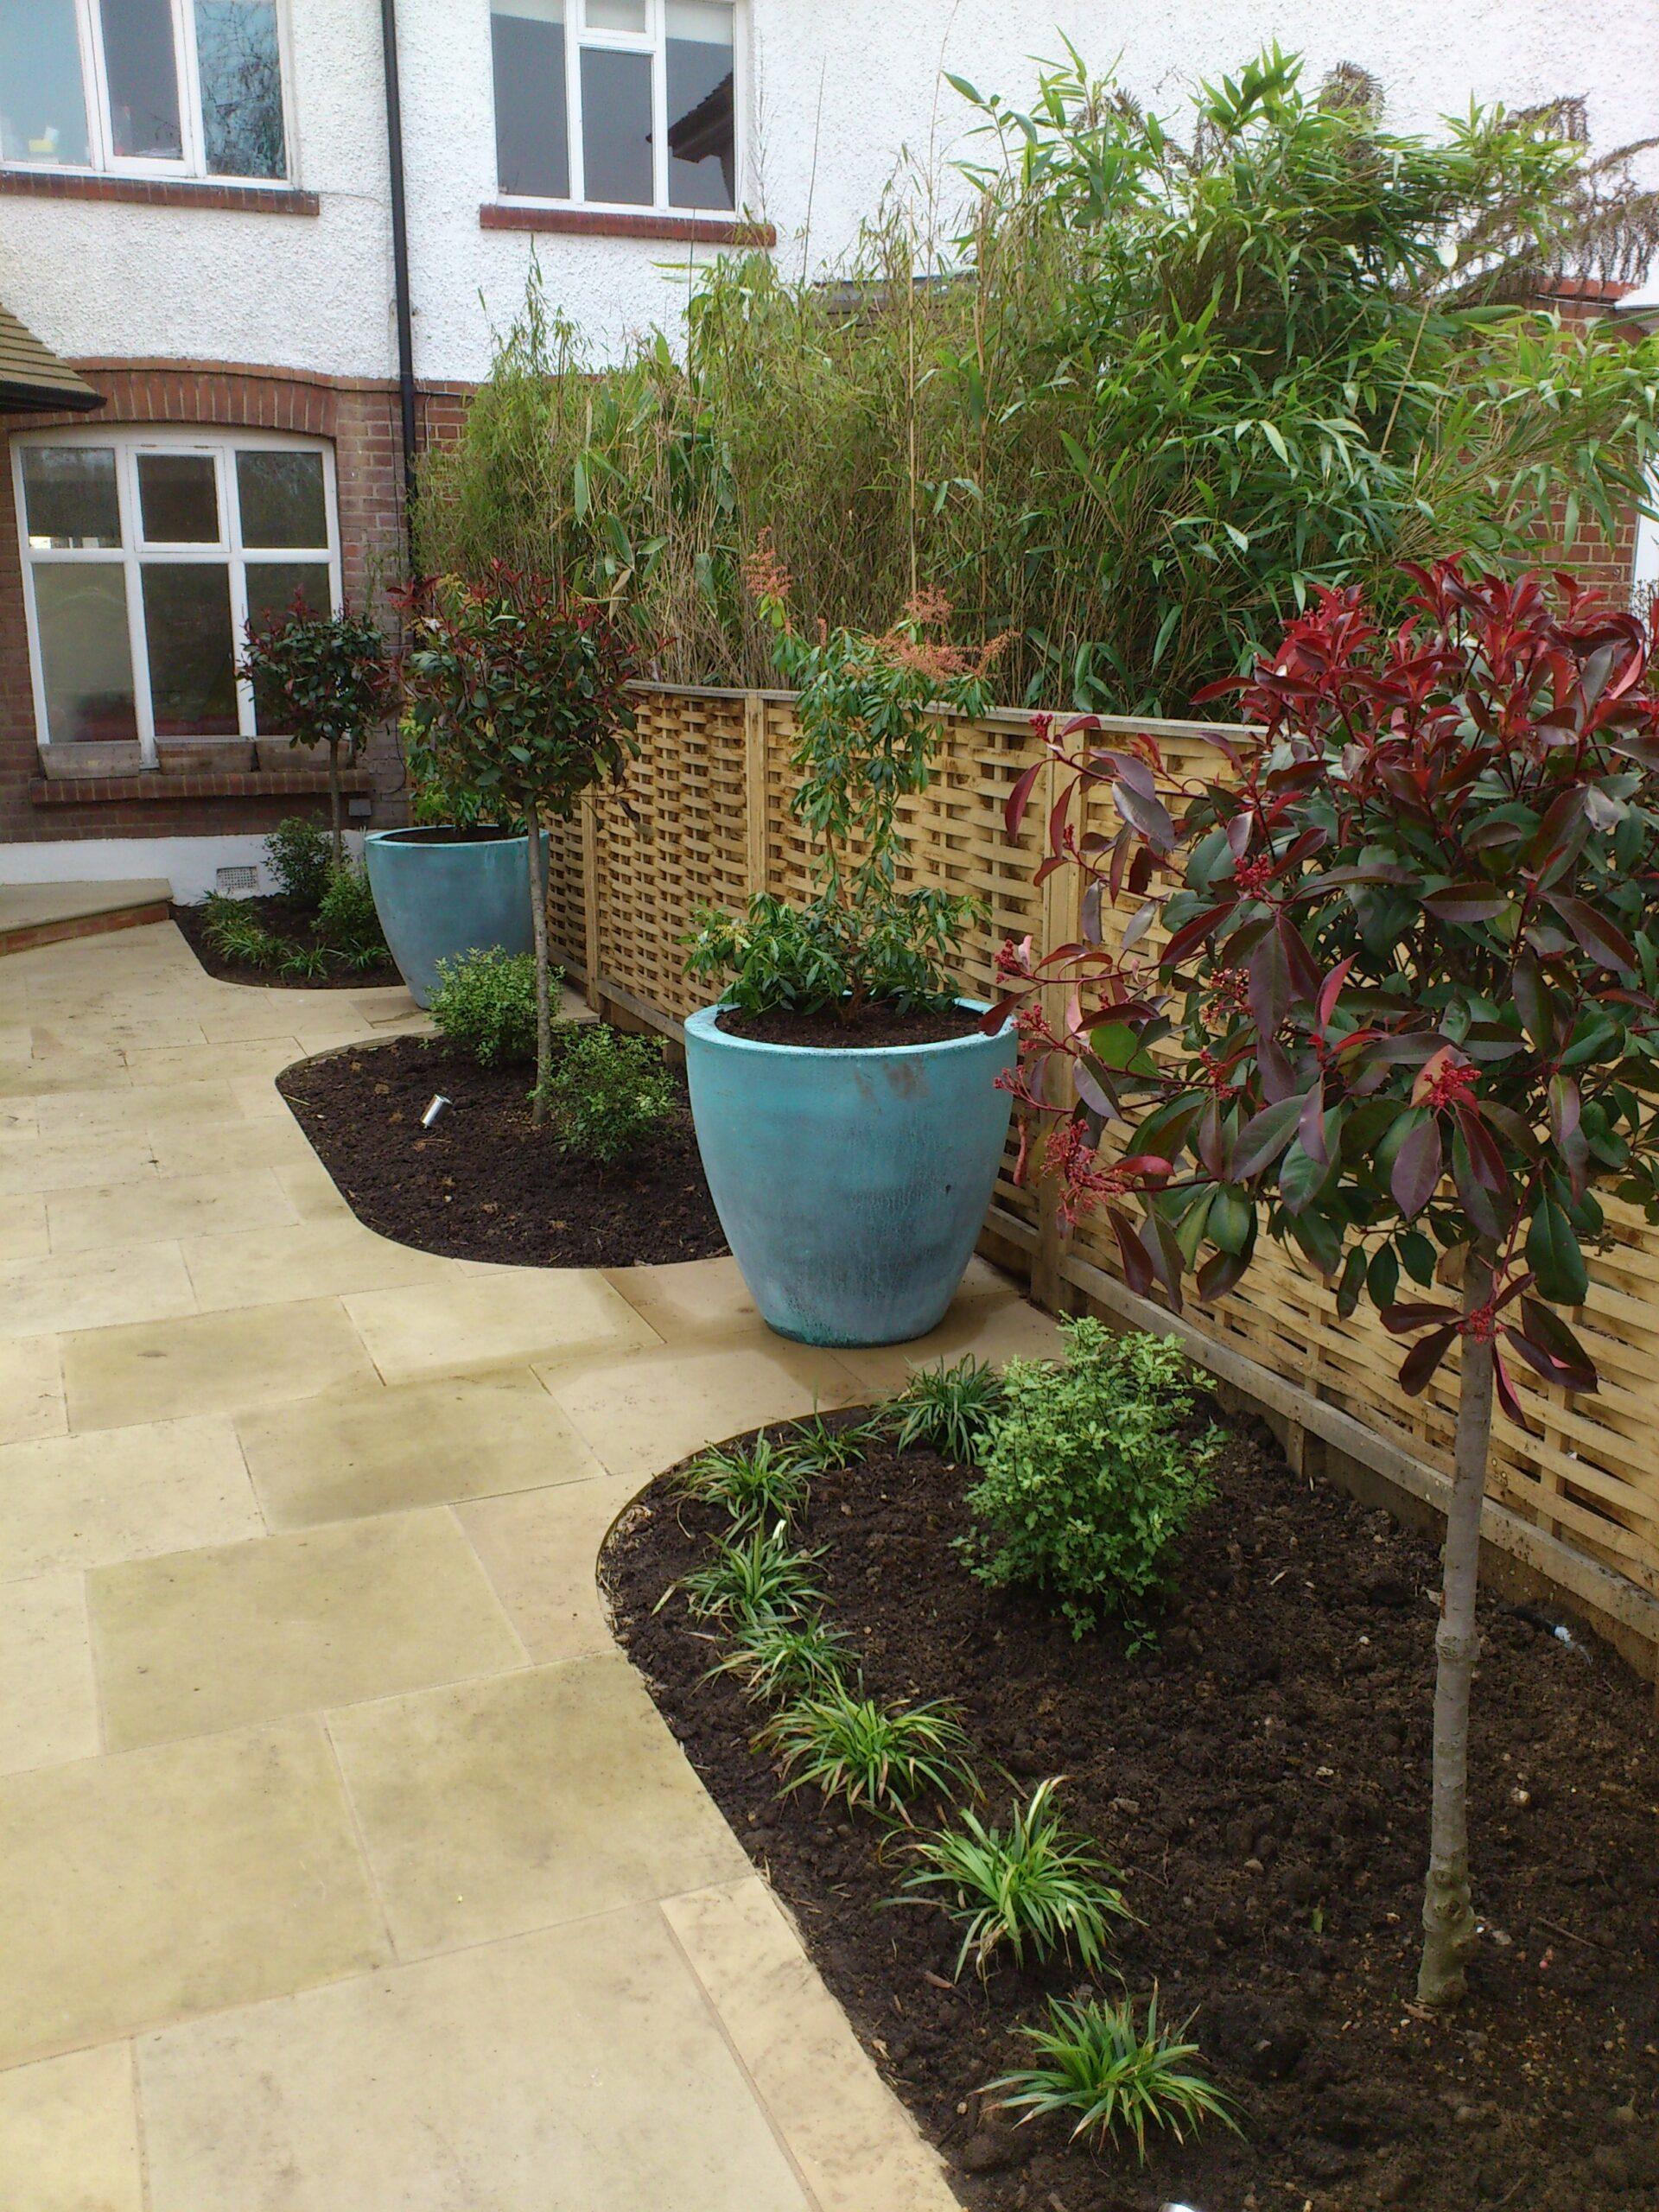 Practical but sleek garden - pots